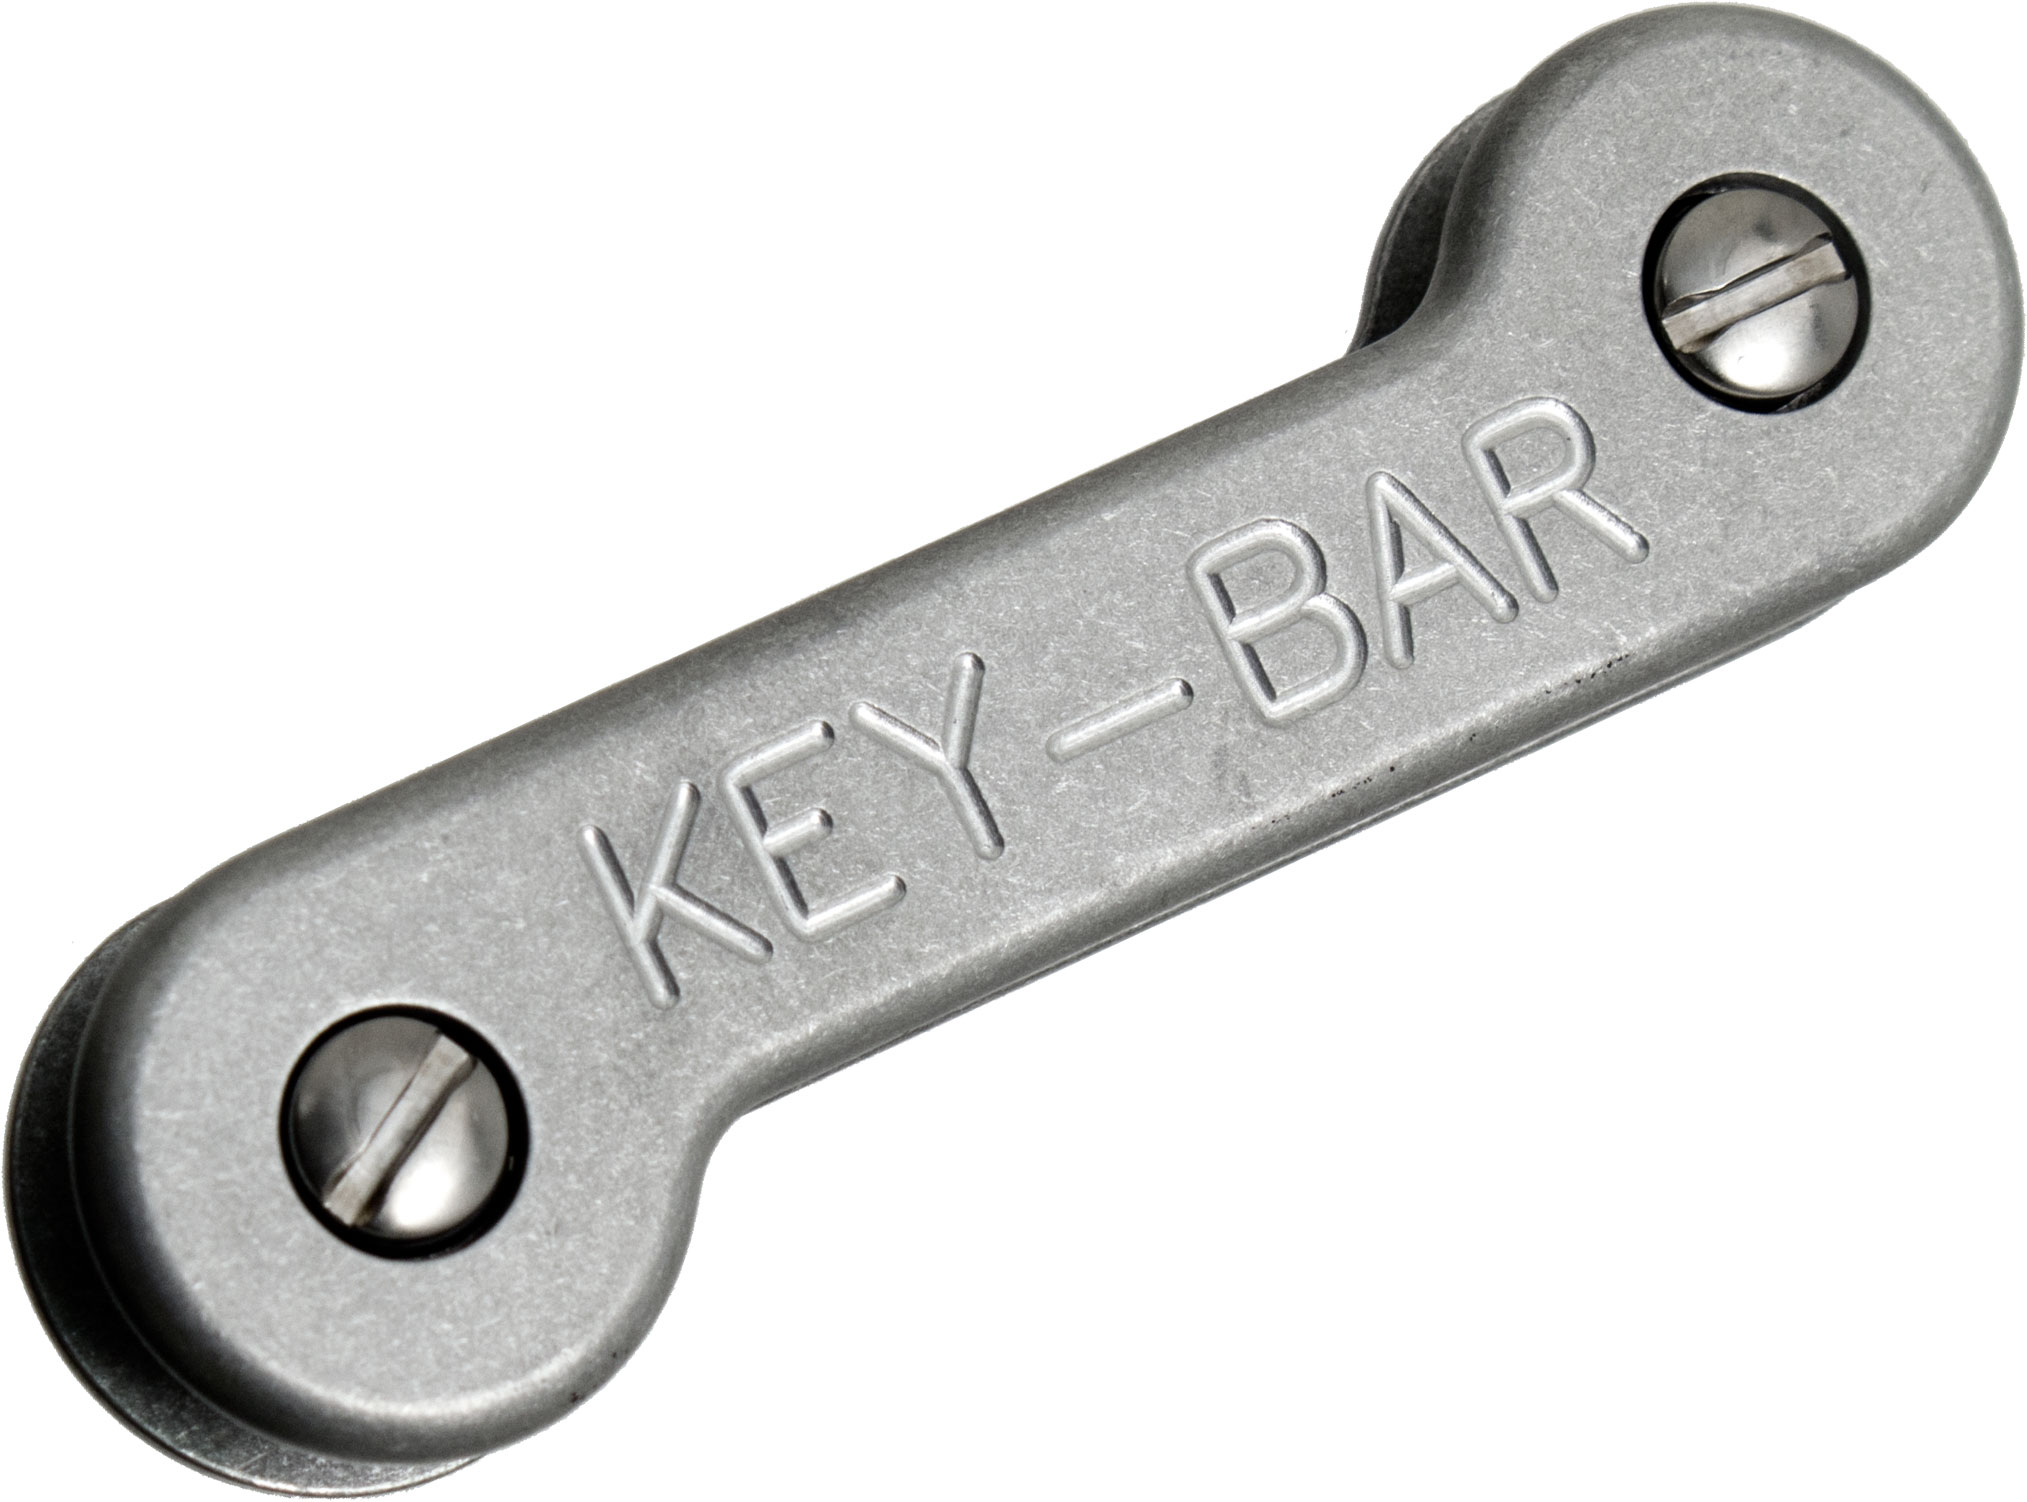 KeyBar Key Organizer Aluminum Model with Pocket Clip, Holds up to 12 Keys